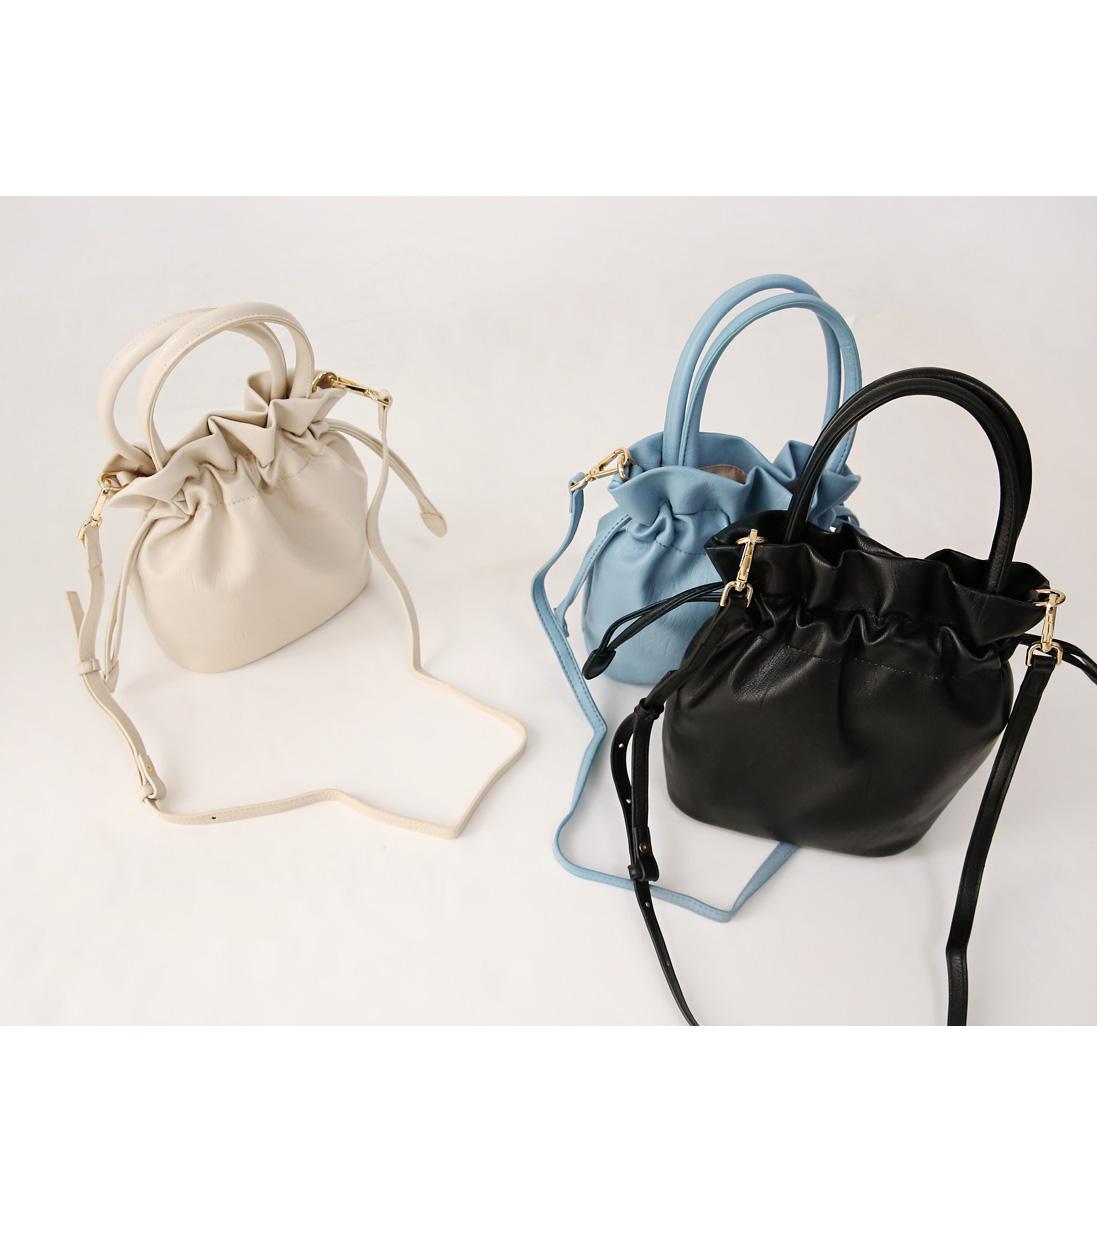 Drawstring Top Handle Handbag